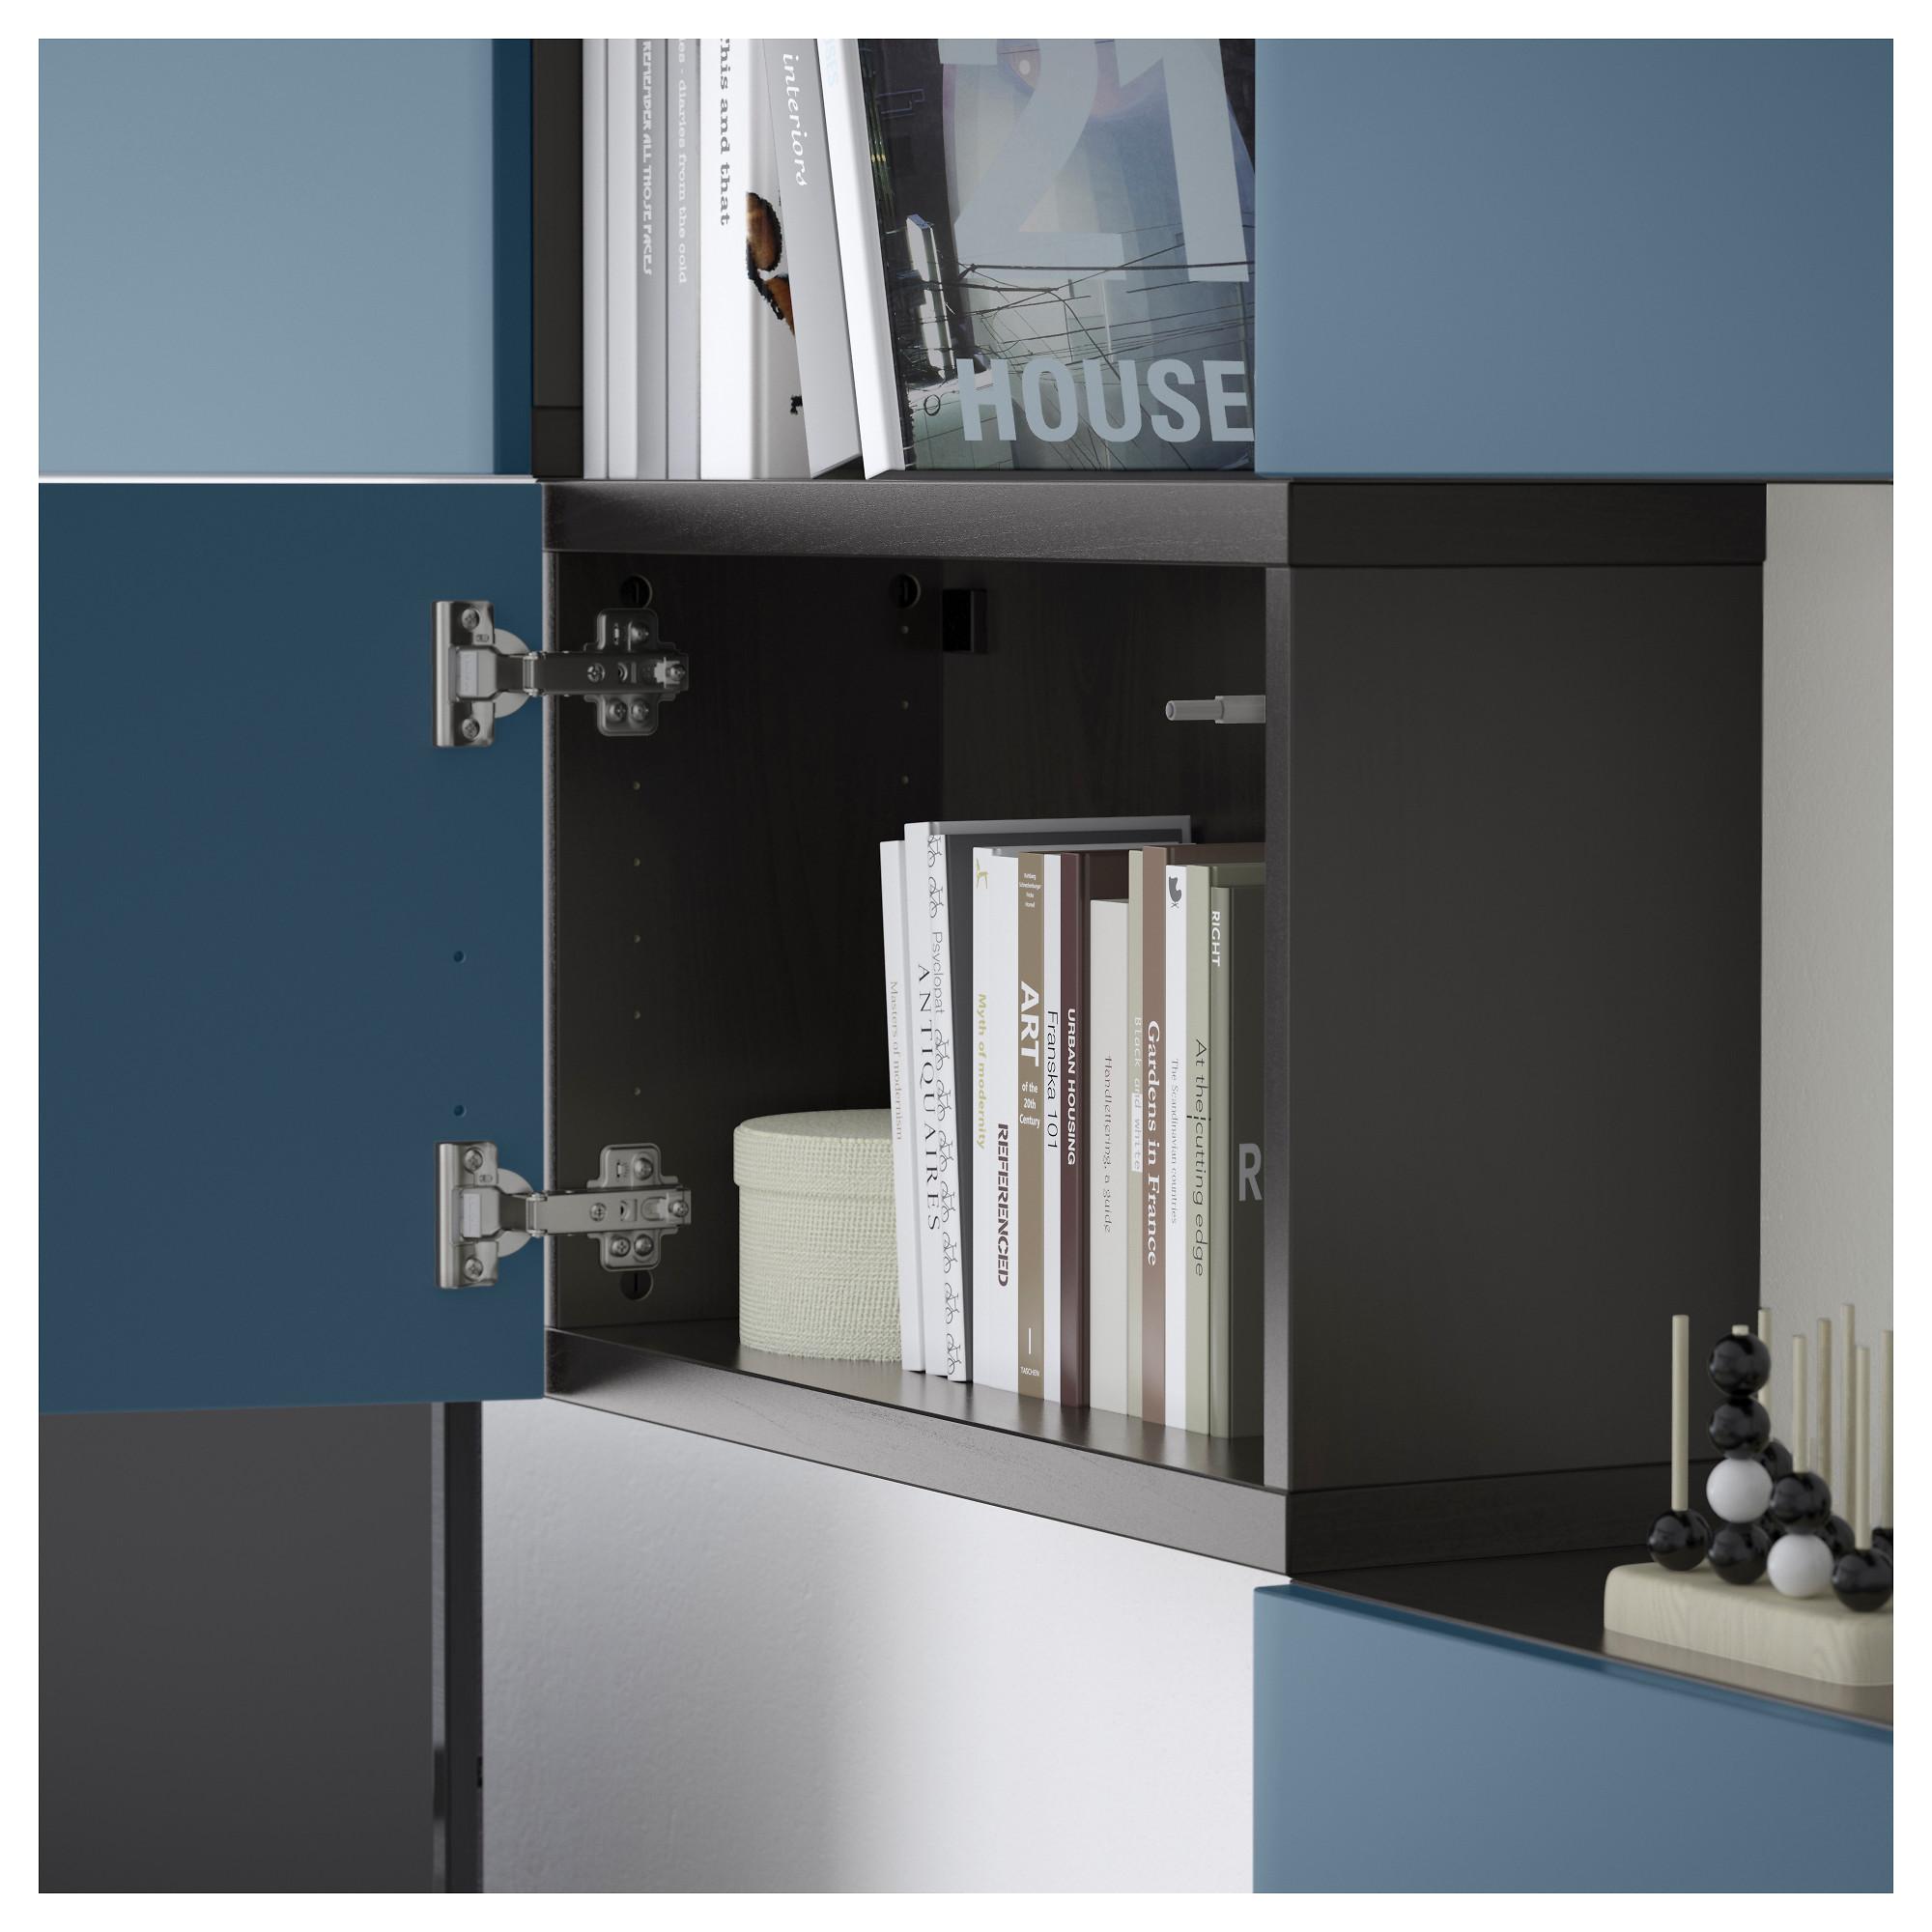 Шкаф для ТВ, комбинация БЕСТО темно-синий артикуль № 092.516.78 в наличии. Онлайн сайт ИКЕА РБ. Недорогая доставка и соборка.